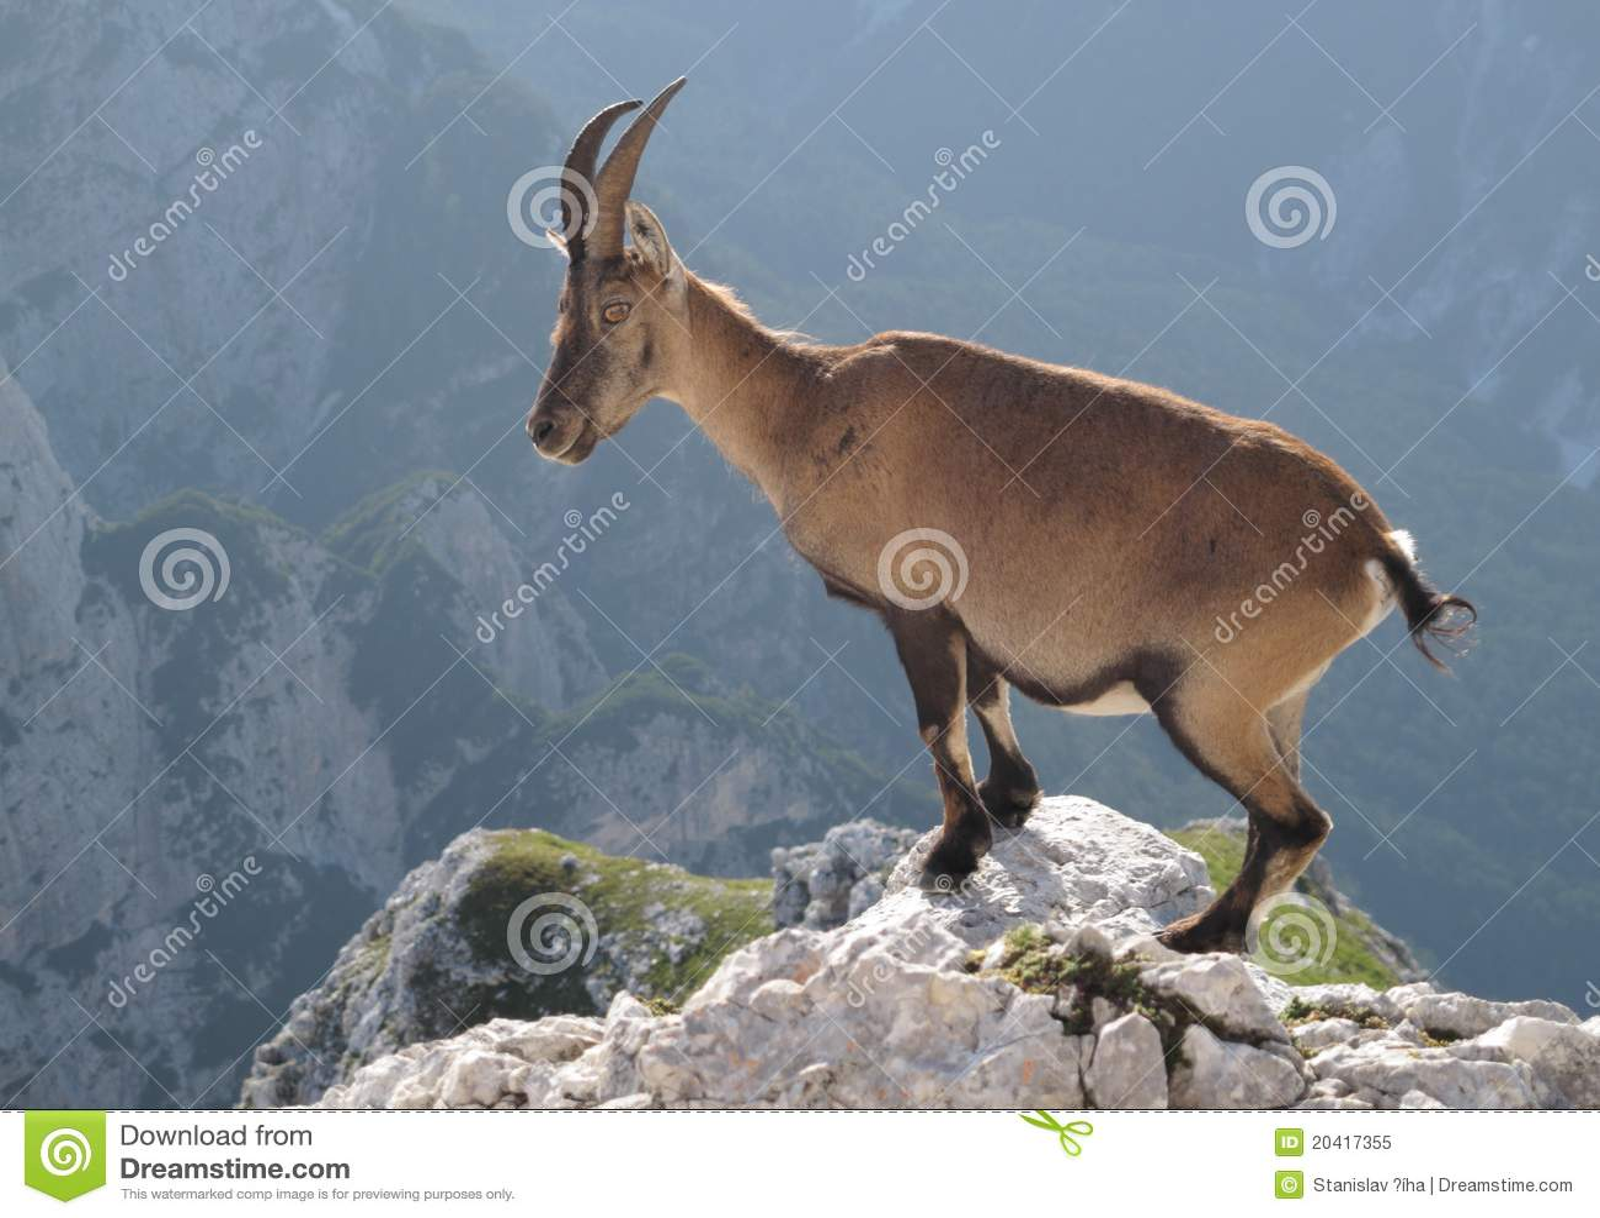 Ibex Goat Mountain goat - Alpine Ibex